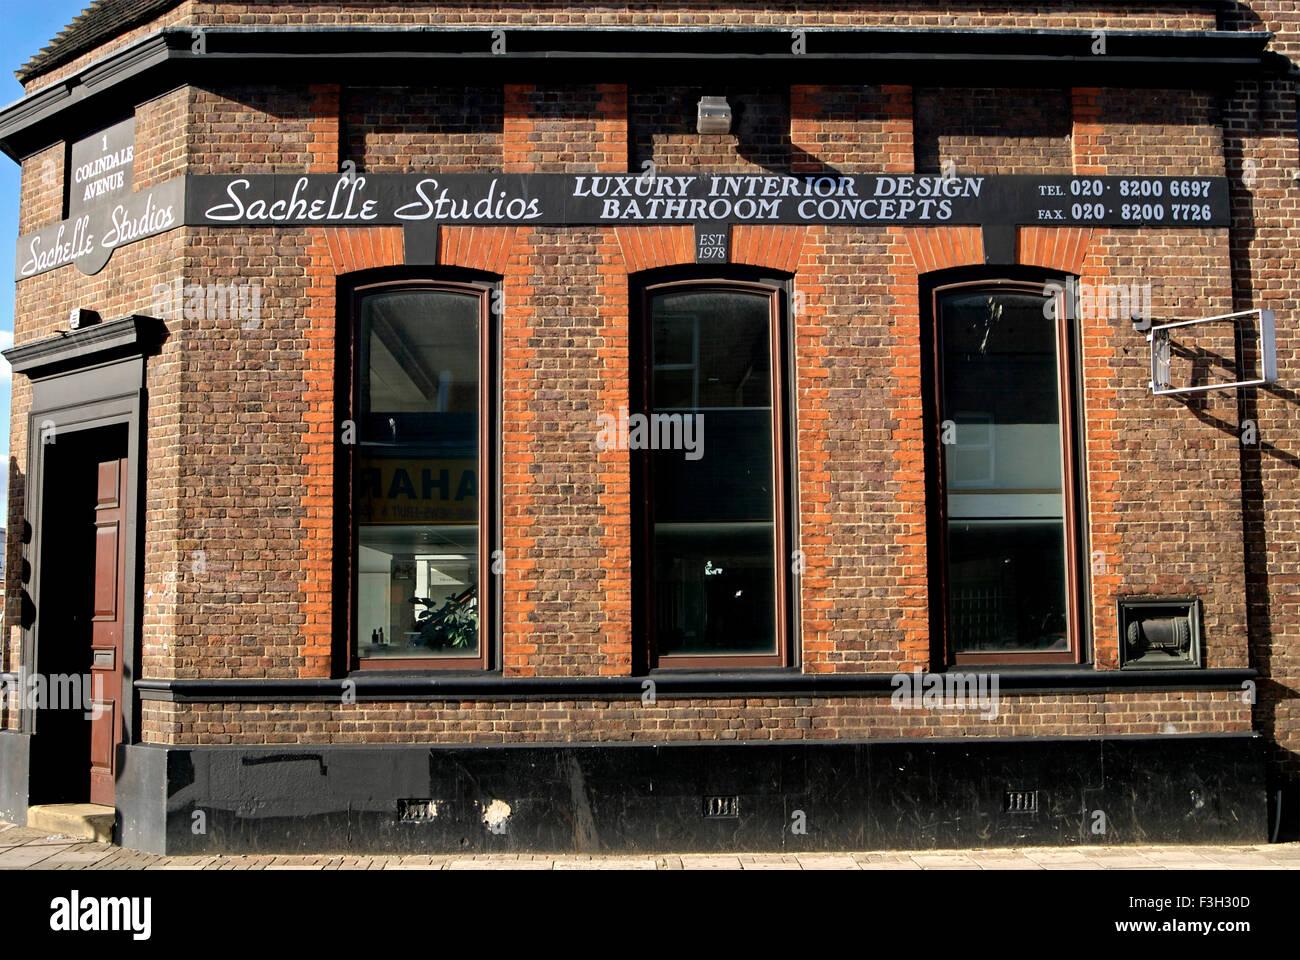 Sachelle Studios ; London ; U.K. United Kingdom England - Stock Image